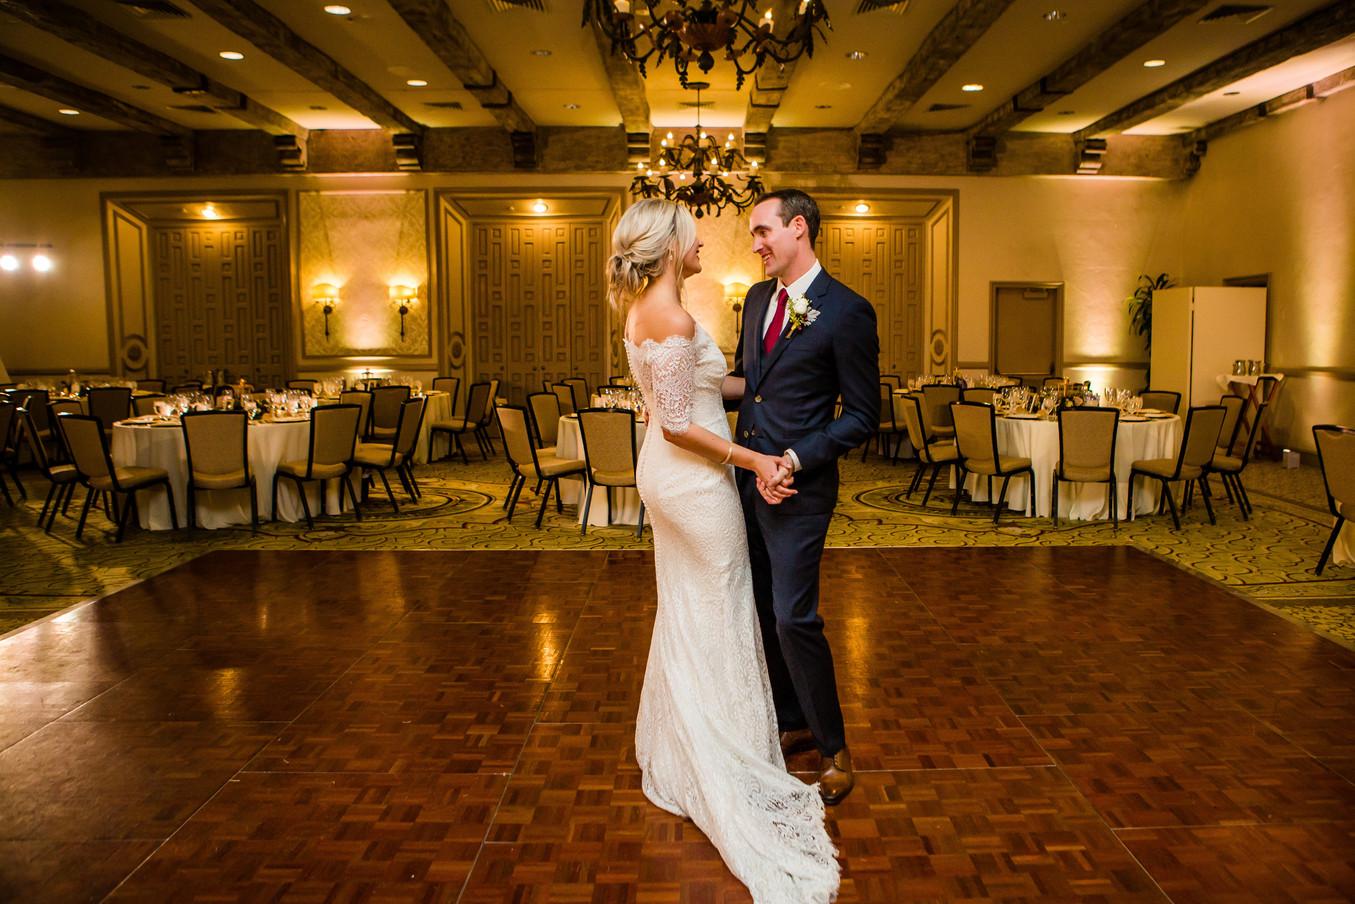 San Diego Wedding Photographer, Berlynn Photography, San Diego Wedding Photography, bride and groom first dance